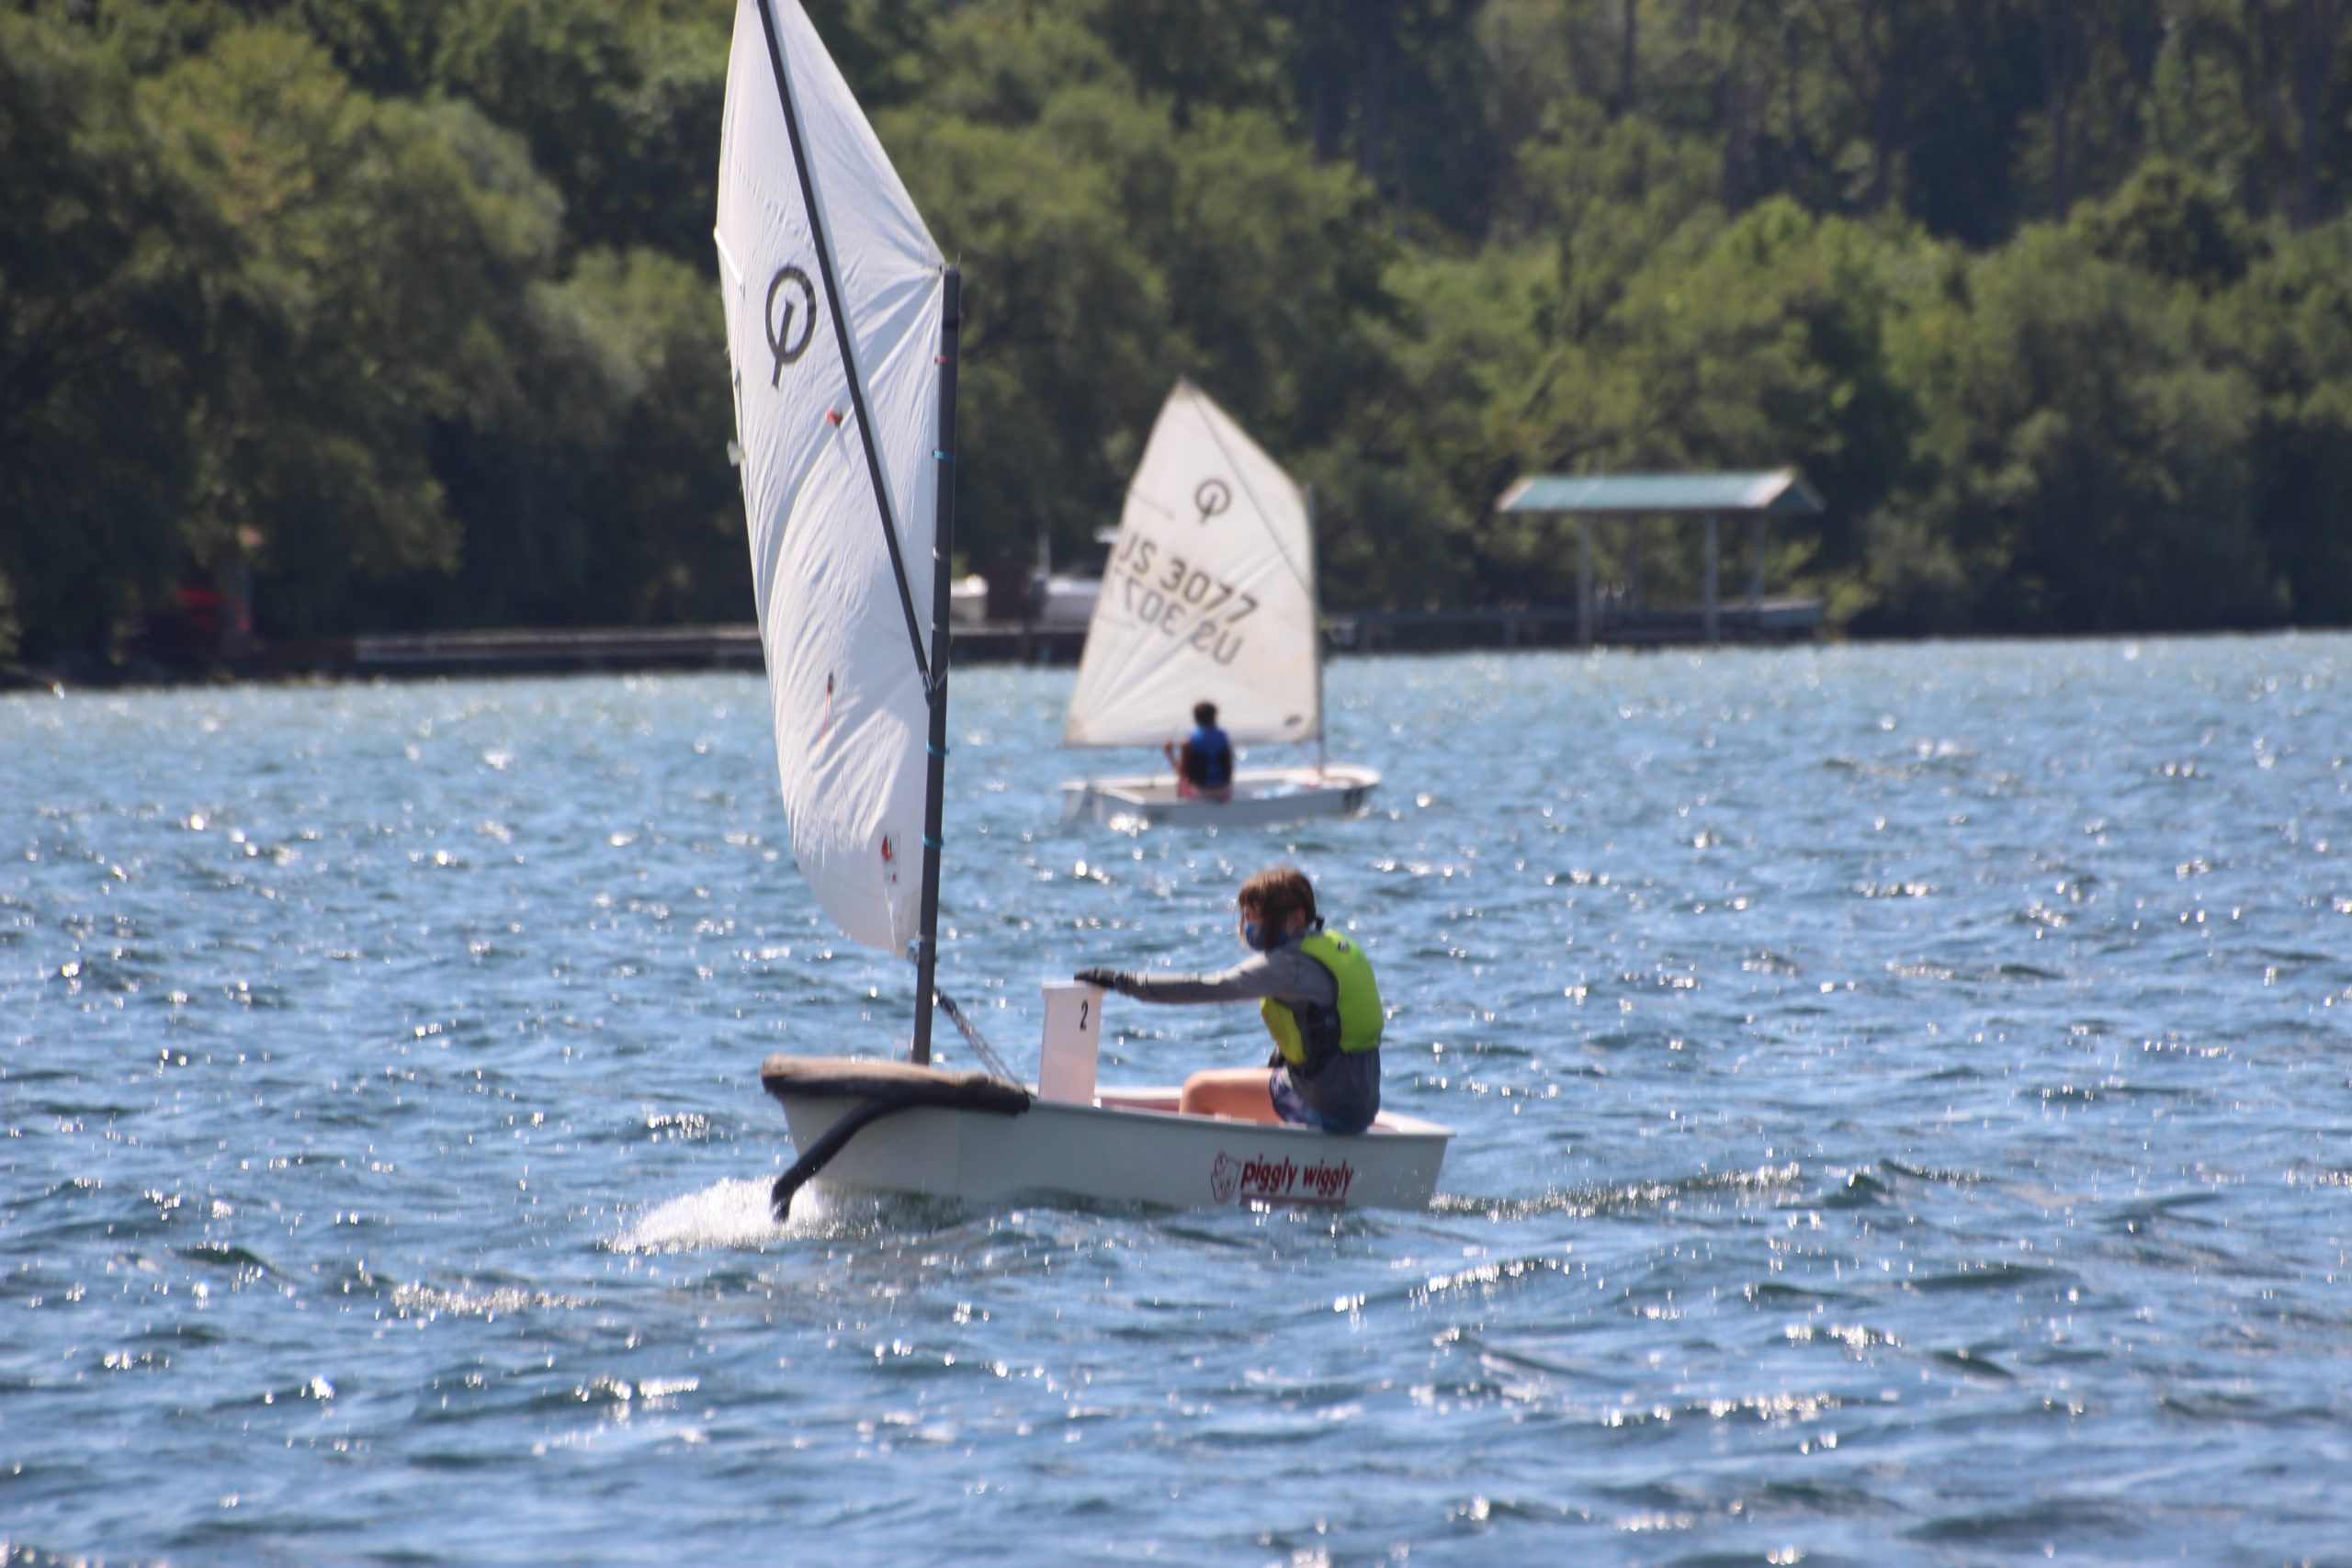 Optimist Prams sailing dinghys on the water.